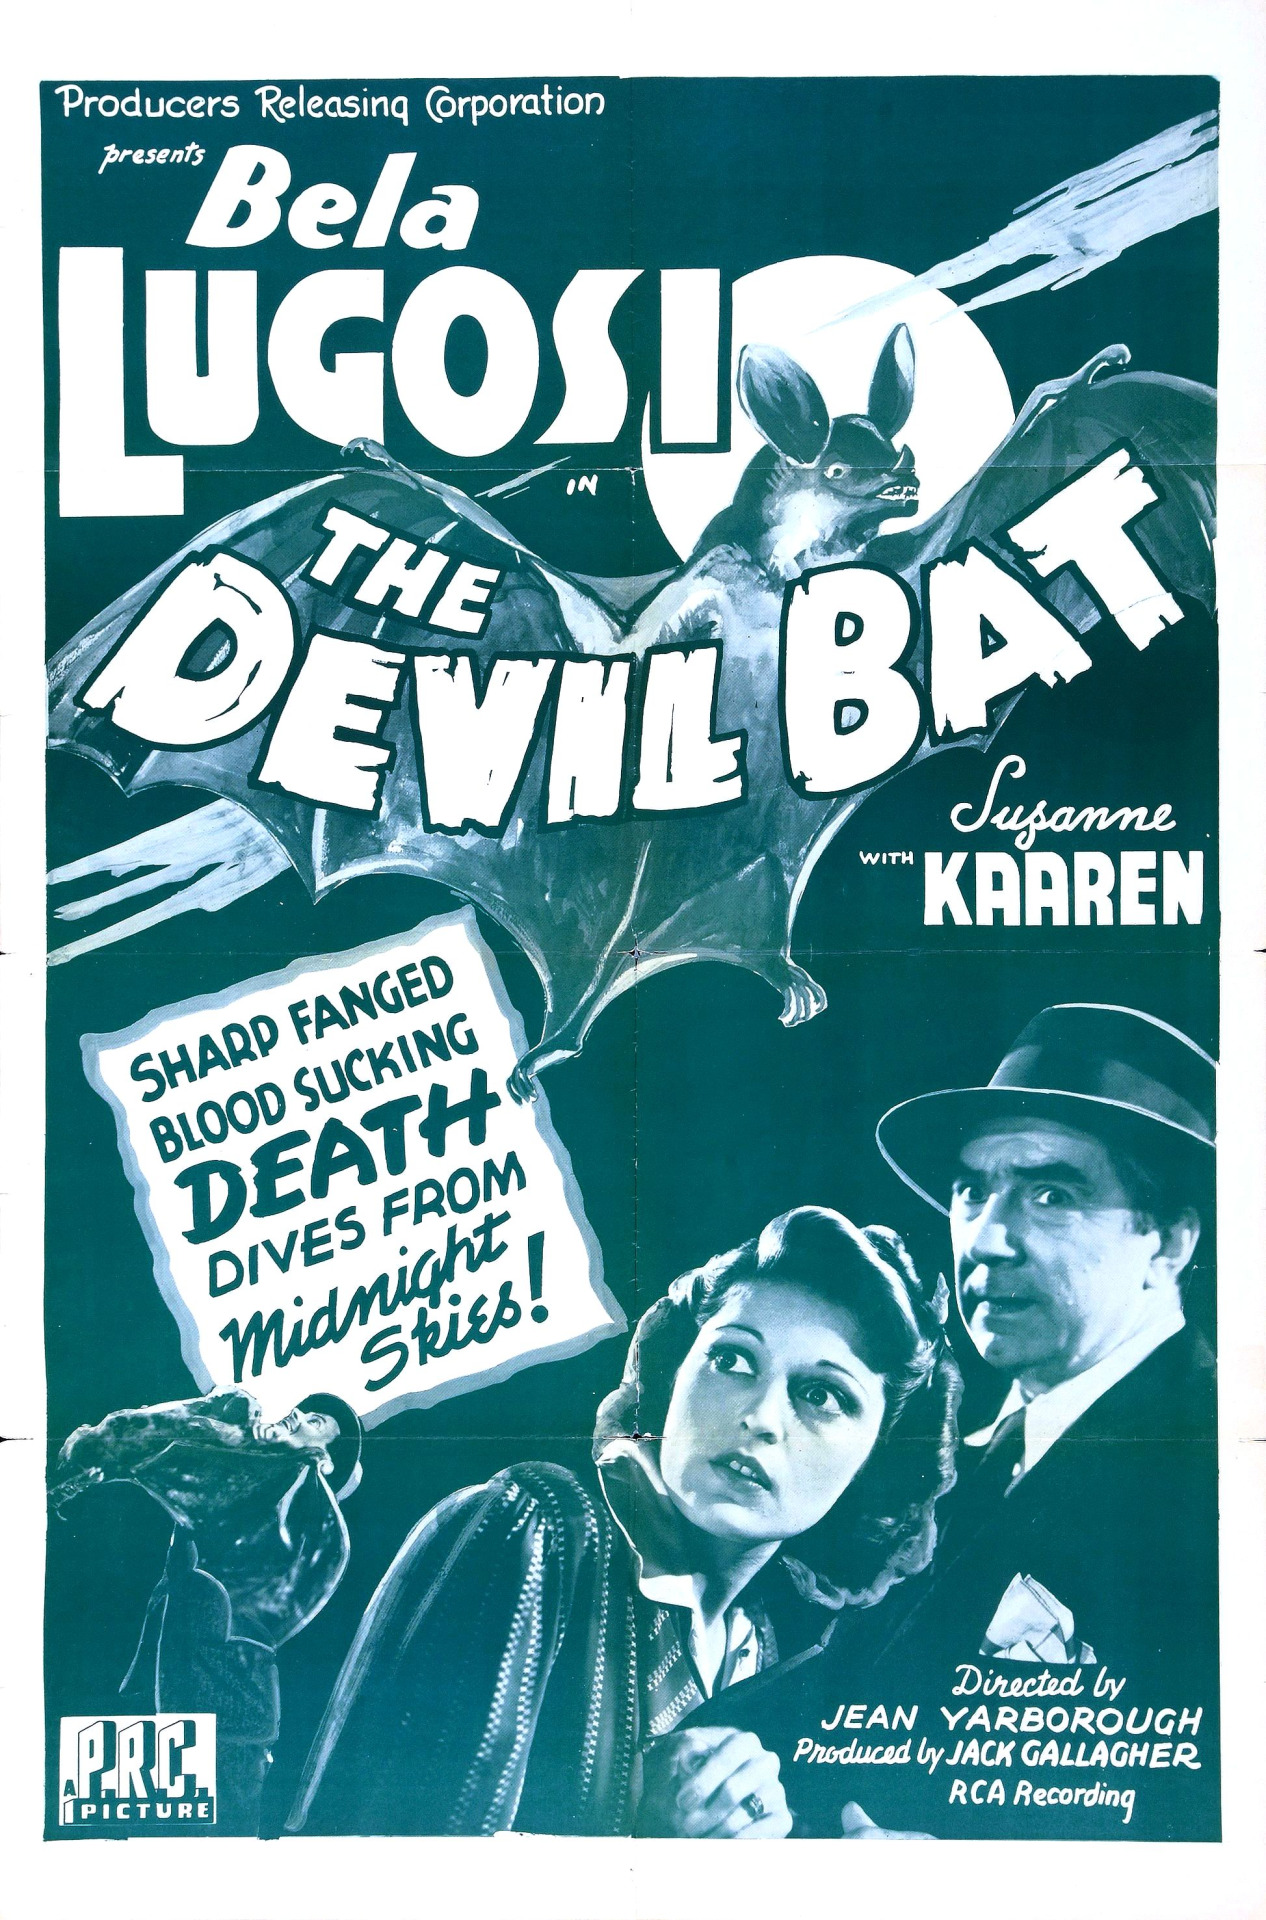 Bela Lugosi and Suzanne Kaaren in The Devil Bat (1940)